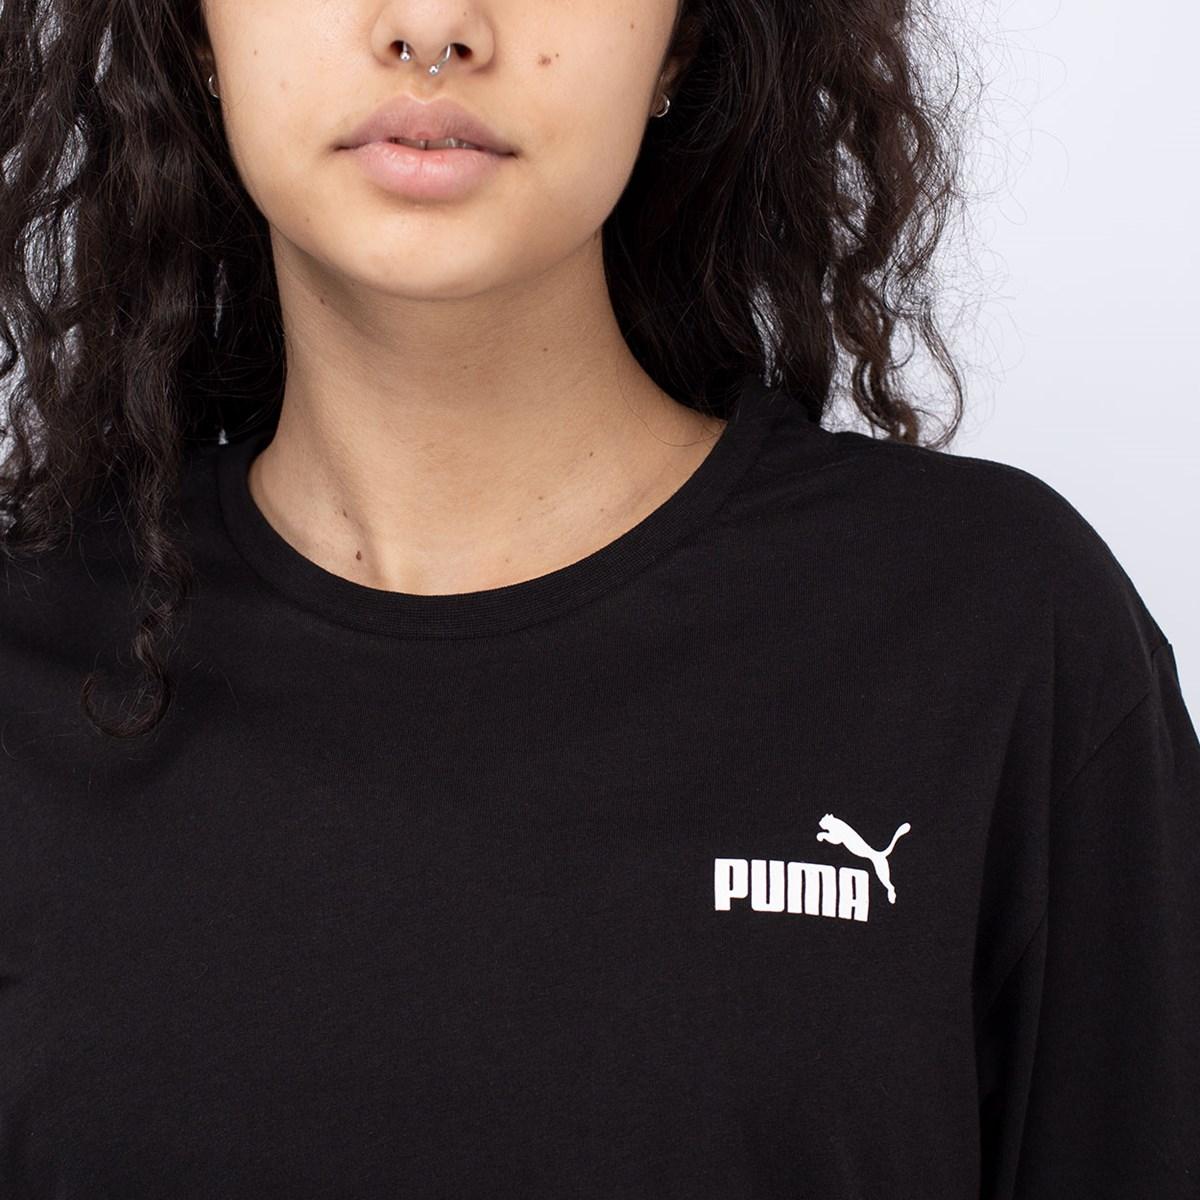 Camiseta Puma Amplified Black 583609-01